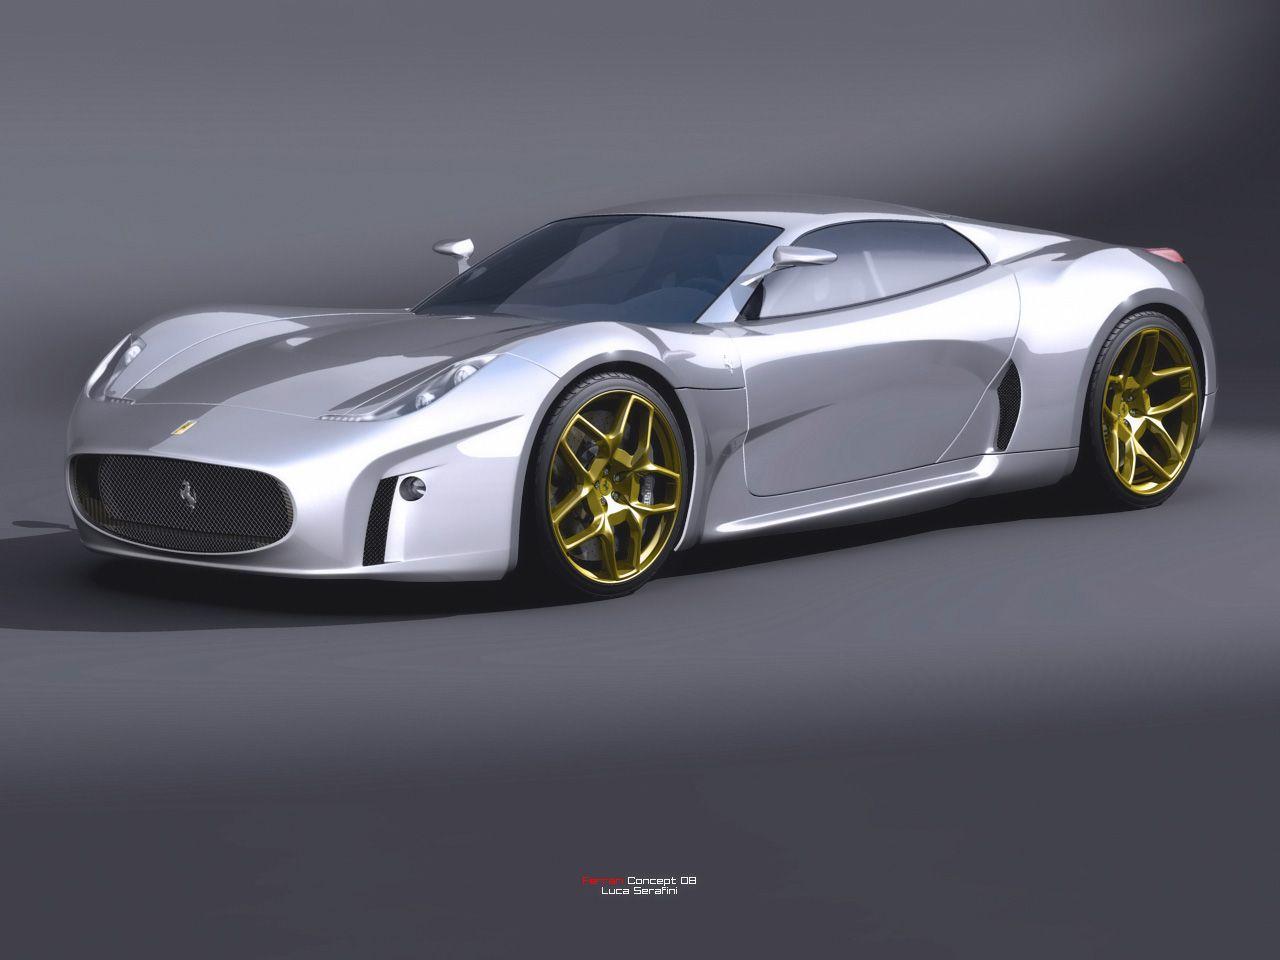 Ferrari luca serafini concept